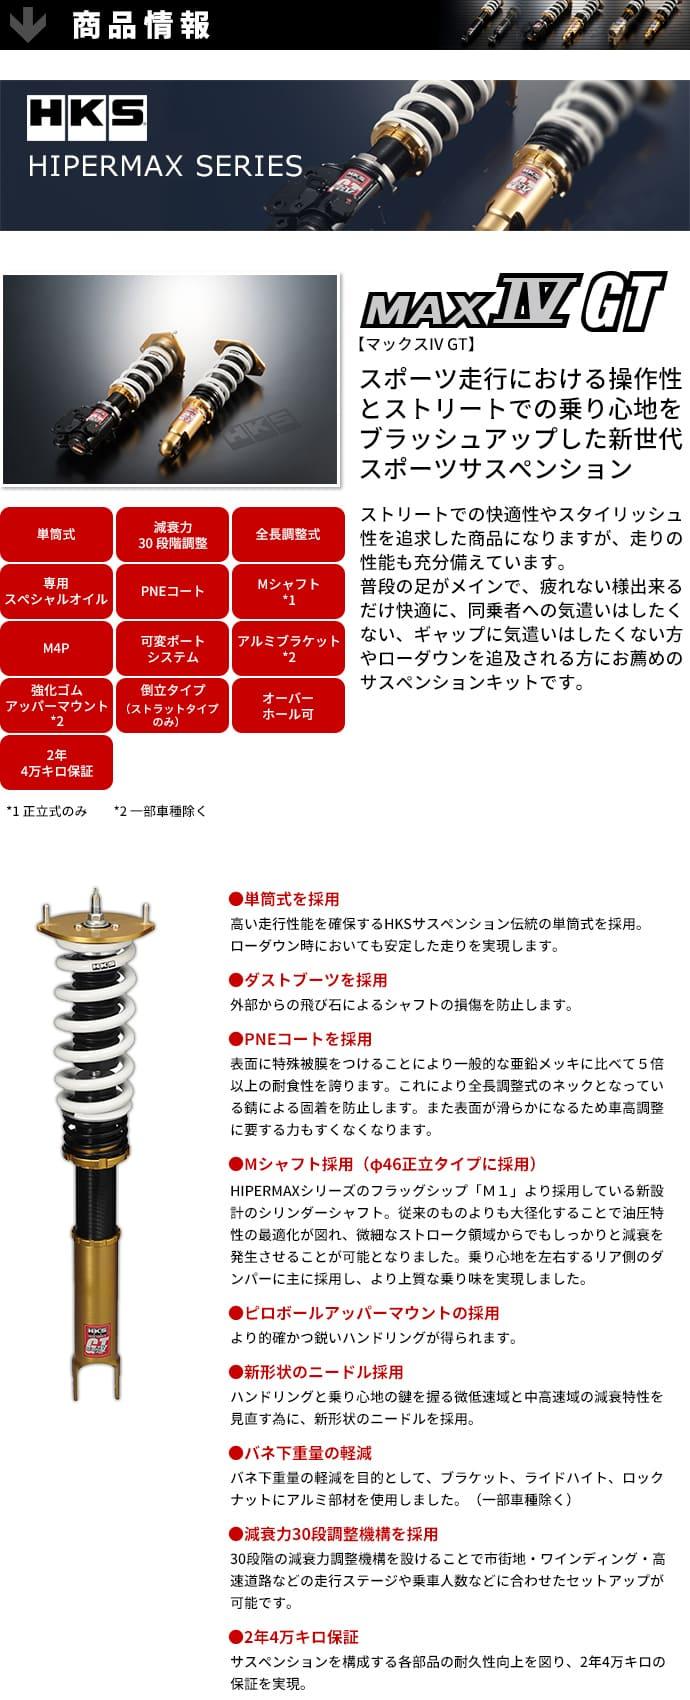 HKS車高調HYPERMAXIVGT(ハイパーマックスIVGT)トヨタアルテッツァジータJCE10W2JZ-GE03/08-05/07